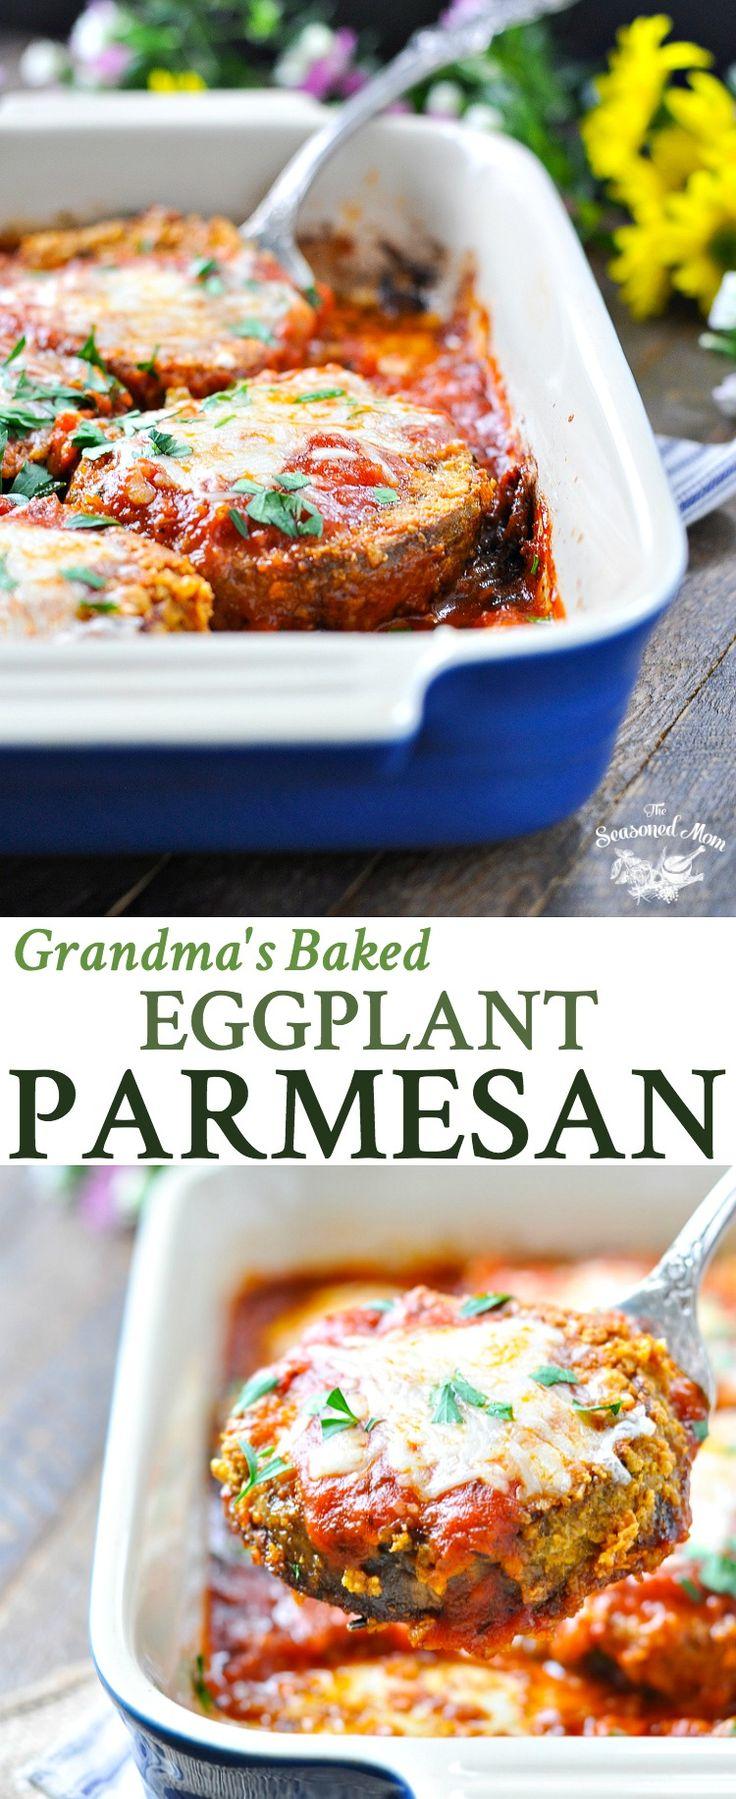 Grandma's Baked Eggplant Parmesan | Vegetarian Recipes Easy | Vegetarian Meals | Easy Dinner Recipes | Dinner Ideas | Italian Recipes | Italian Food